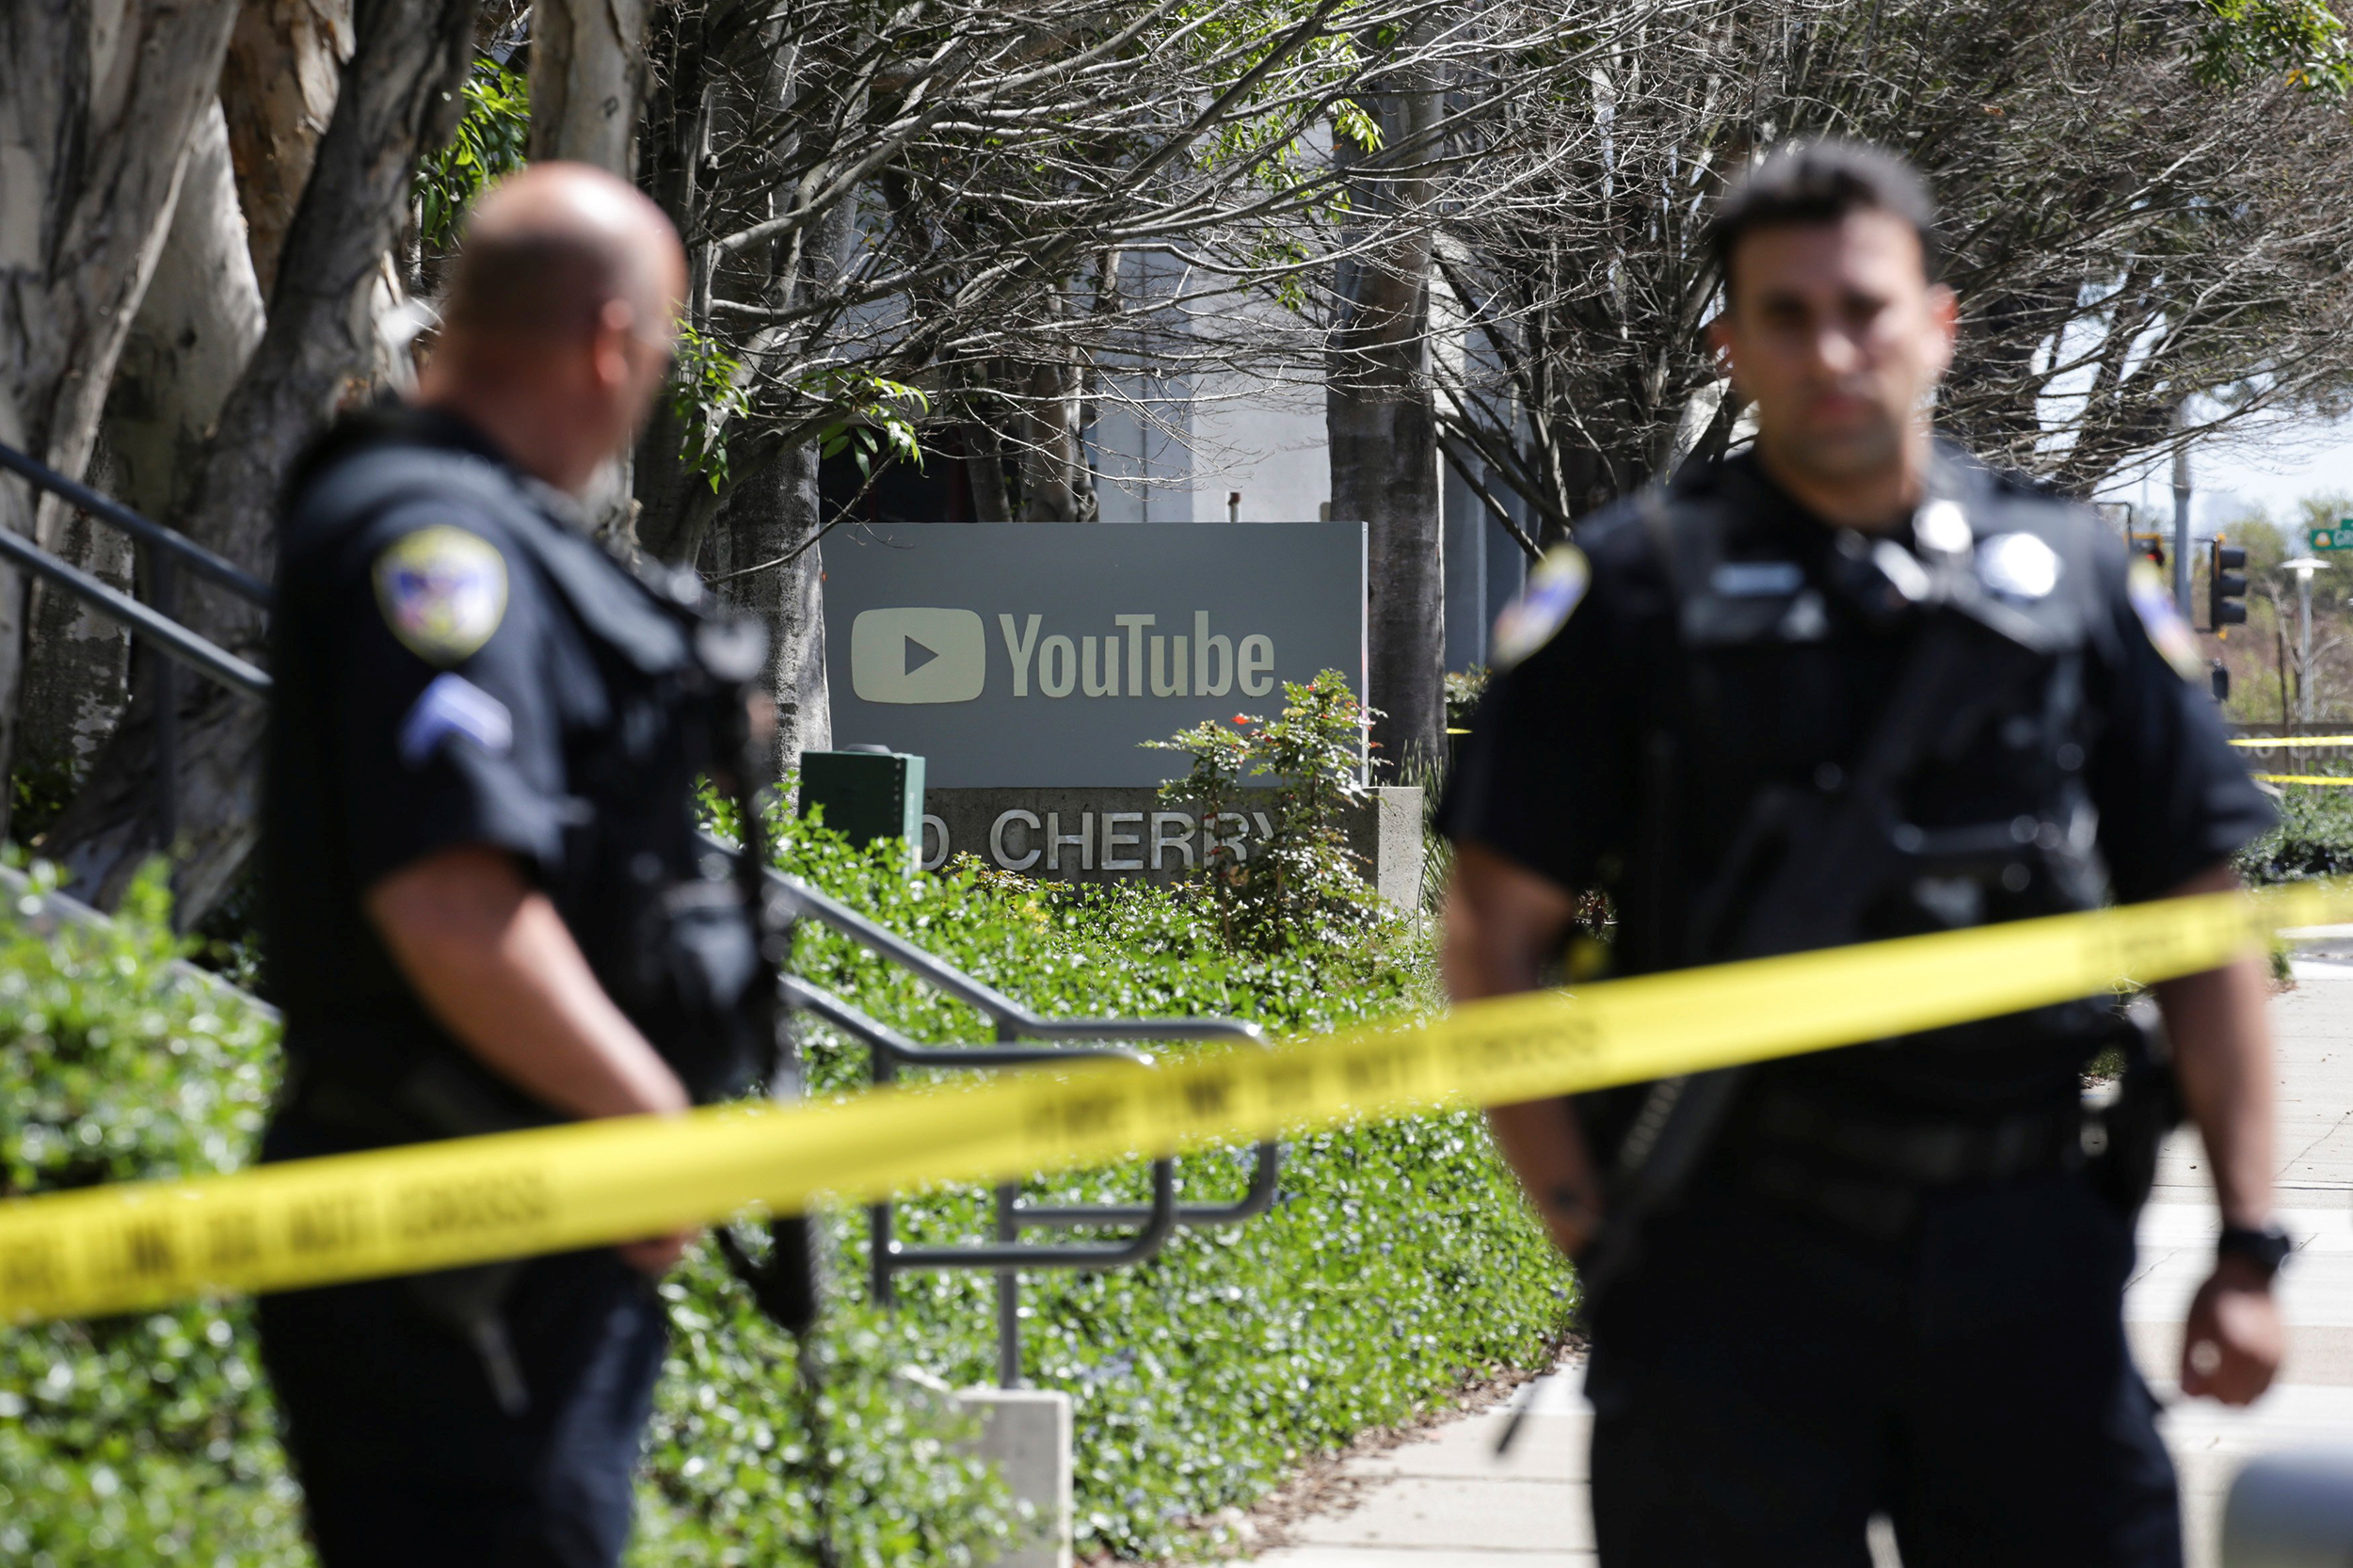 youtube shooter nasim aghdam's father baffledher violence